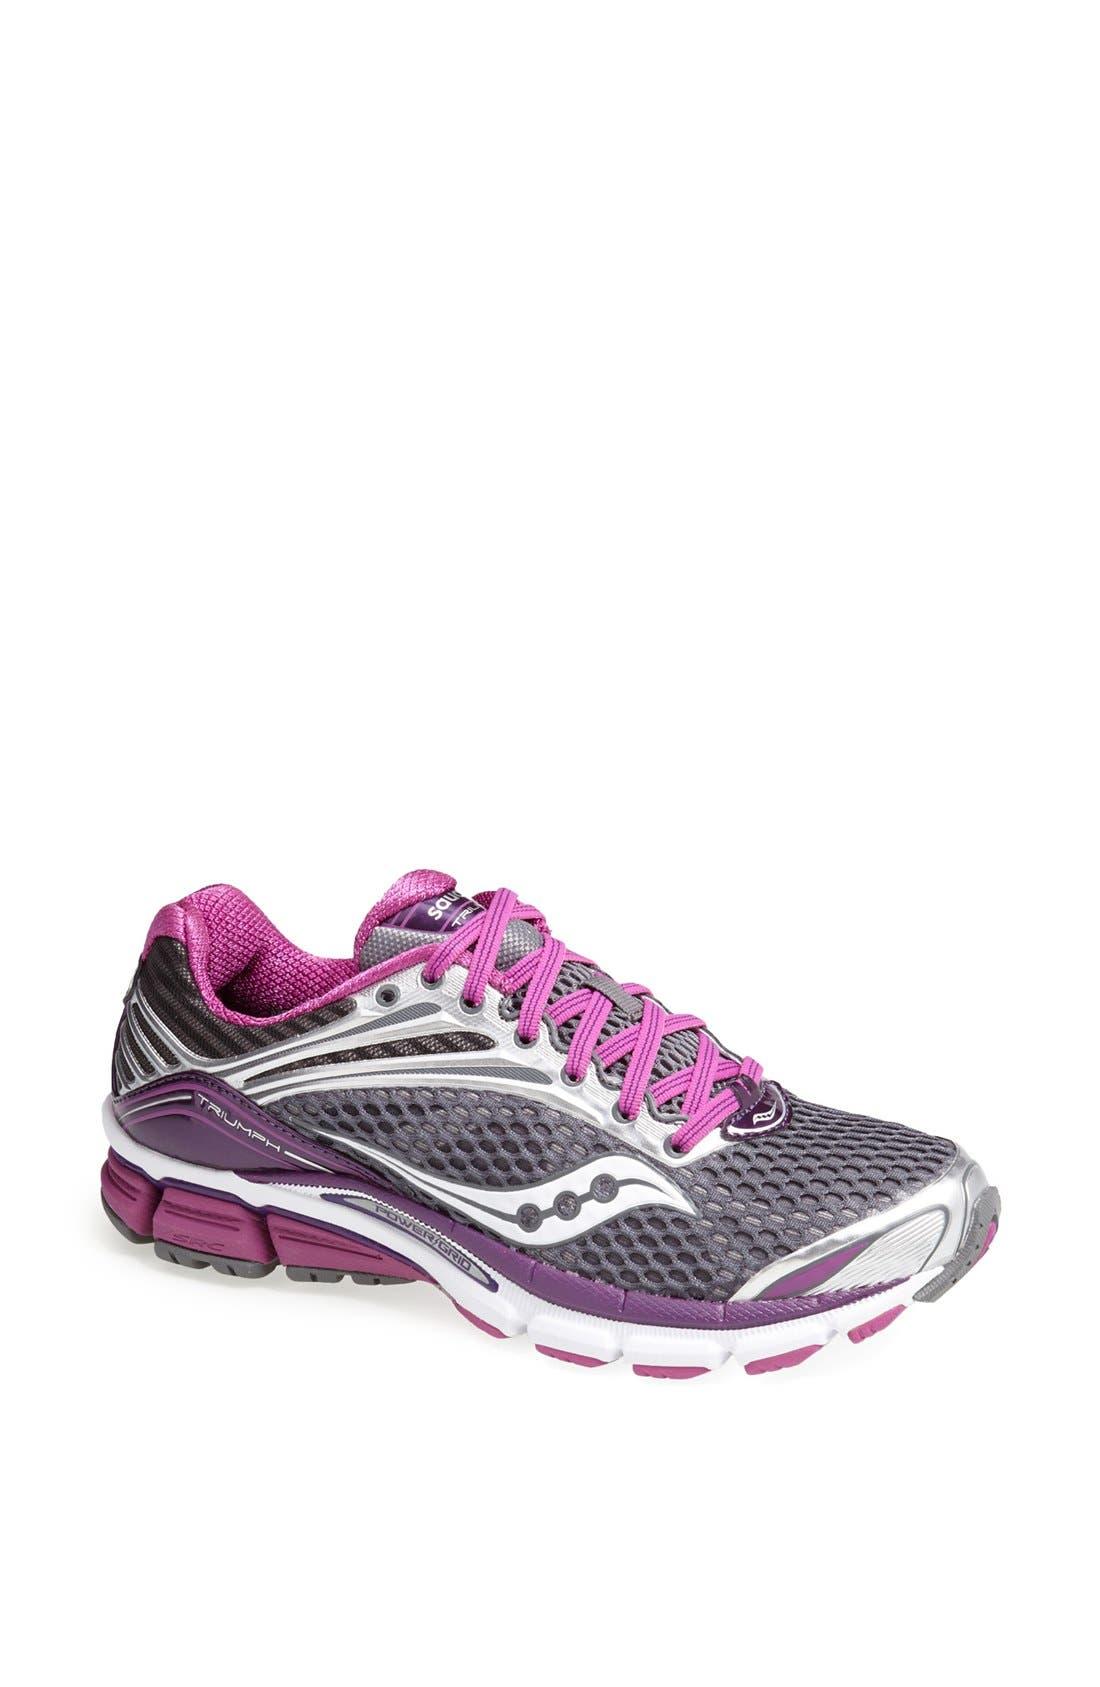 Alternate Image 1 Selected - Saucony 'Triumph 11' Running Shoe (Women)